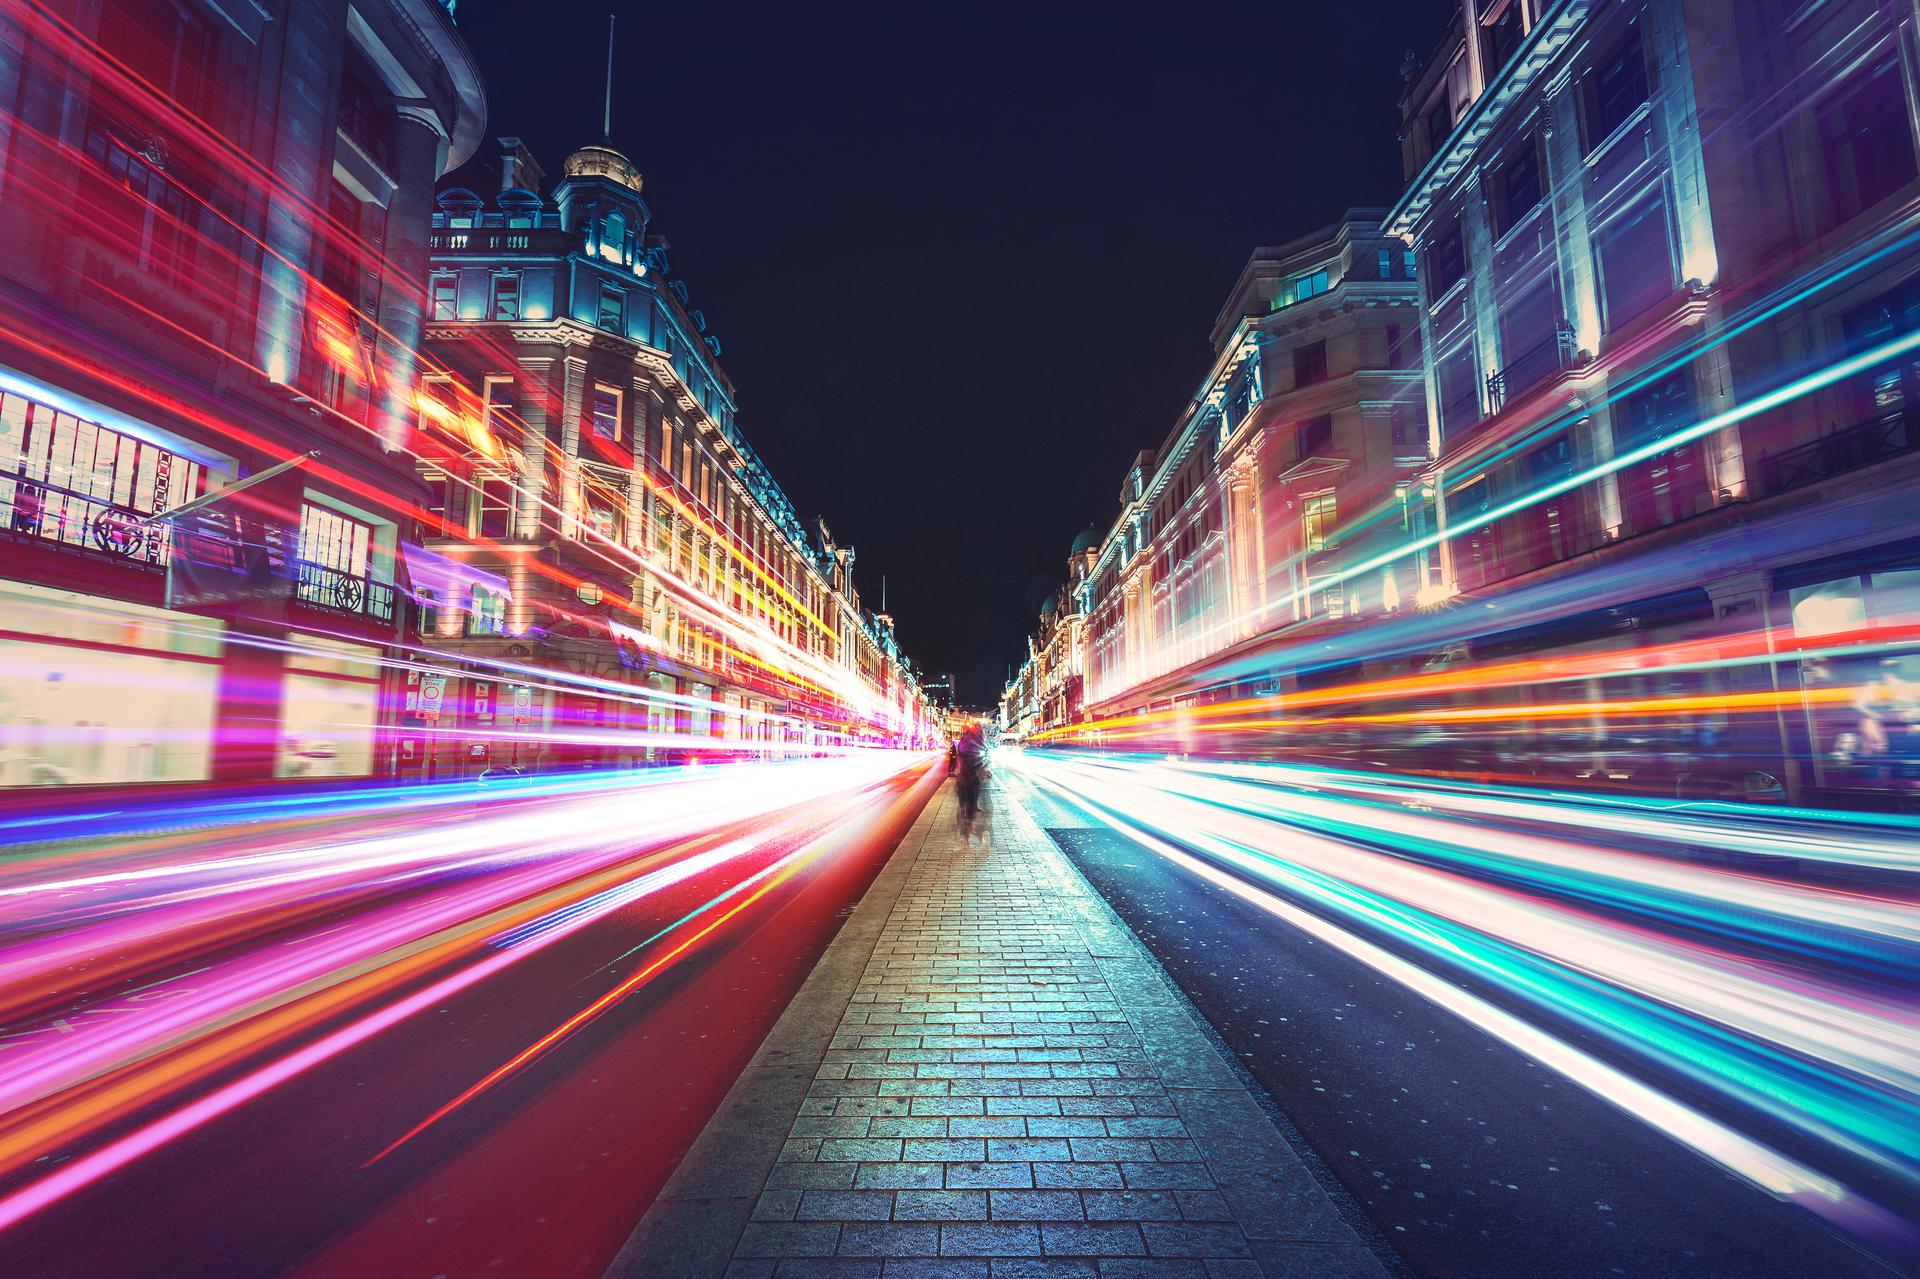 bright-lights-city-street